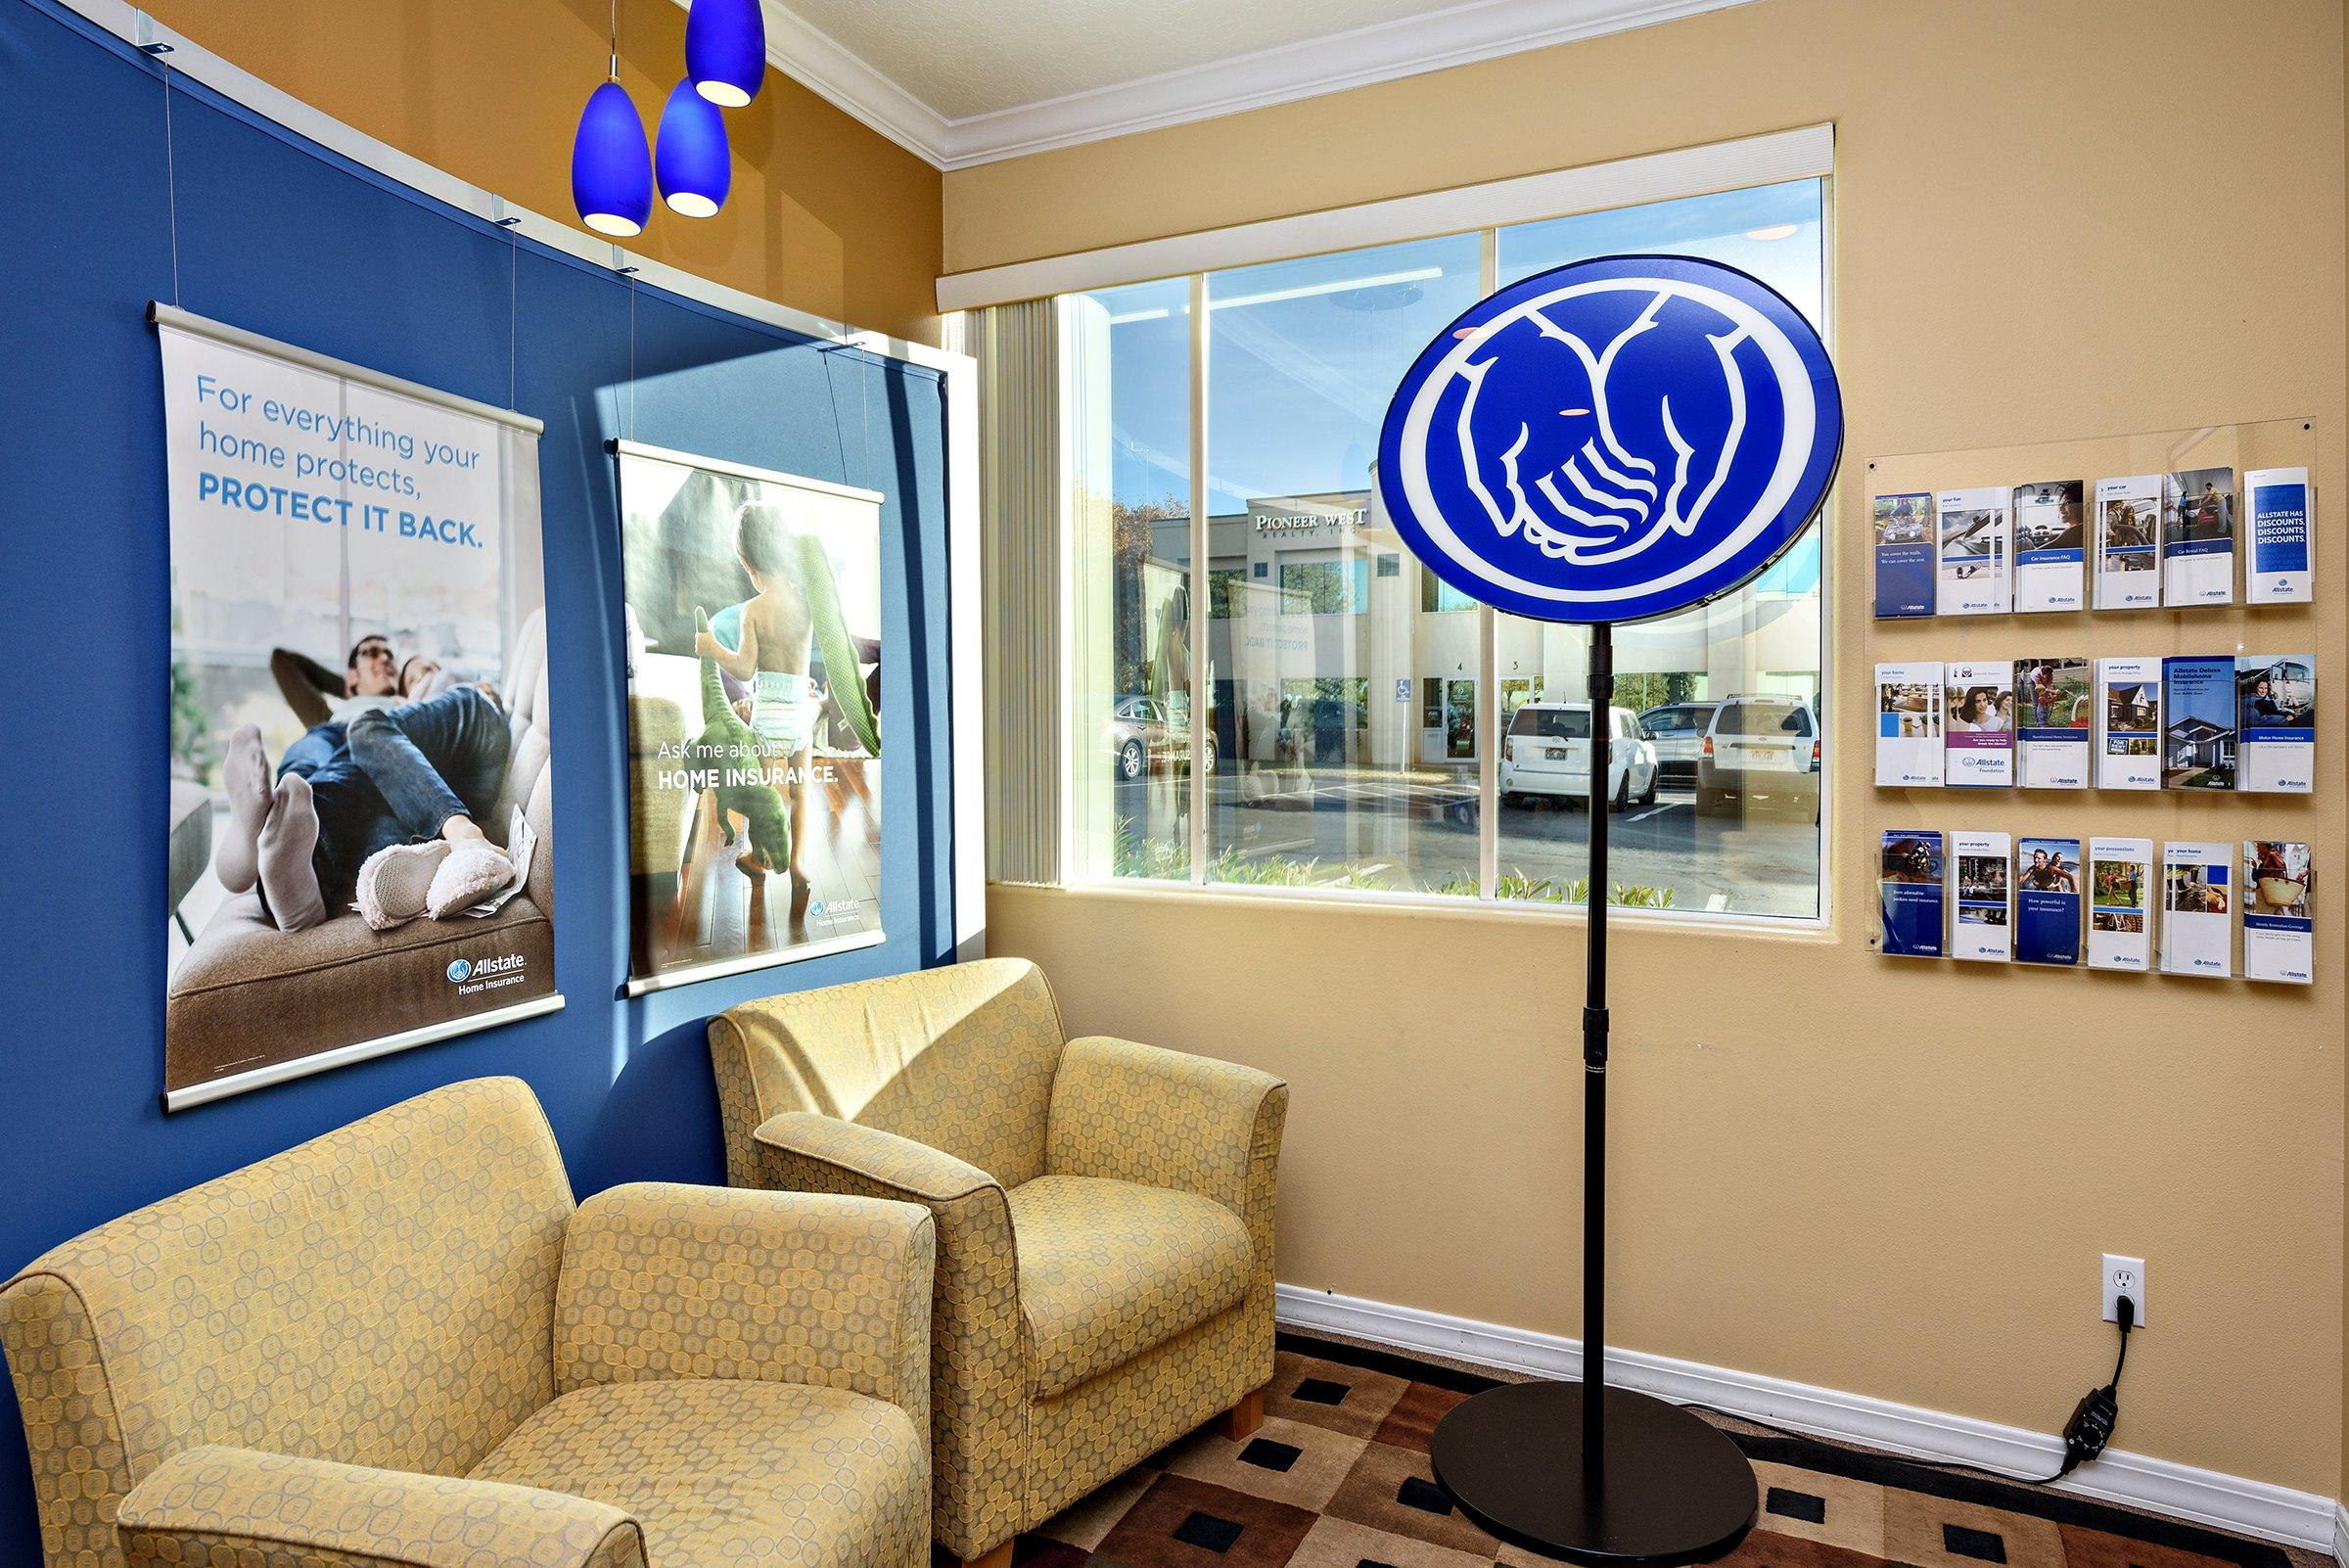 The Shonie Insurance Group, LLC: Allstate Insurance image 4